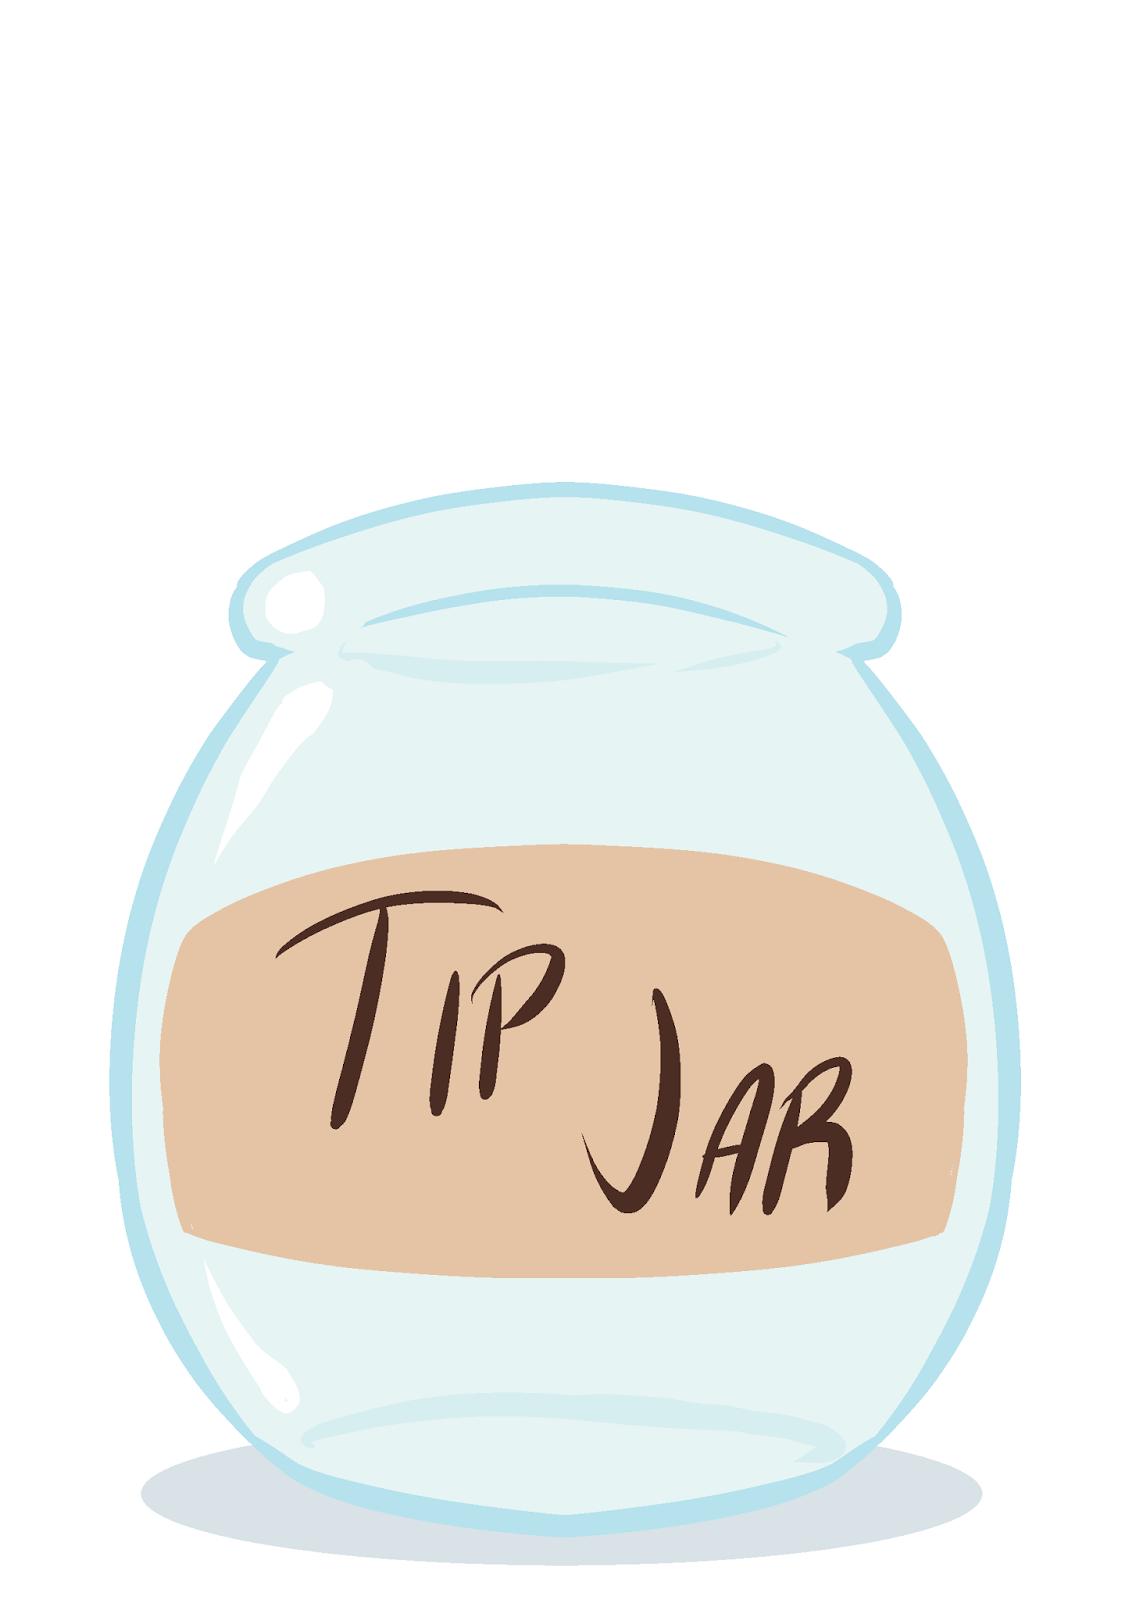 Tip Jar PNG - 57354